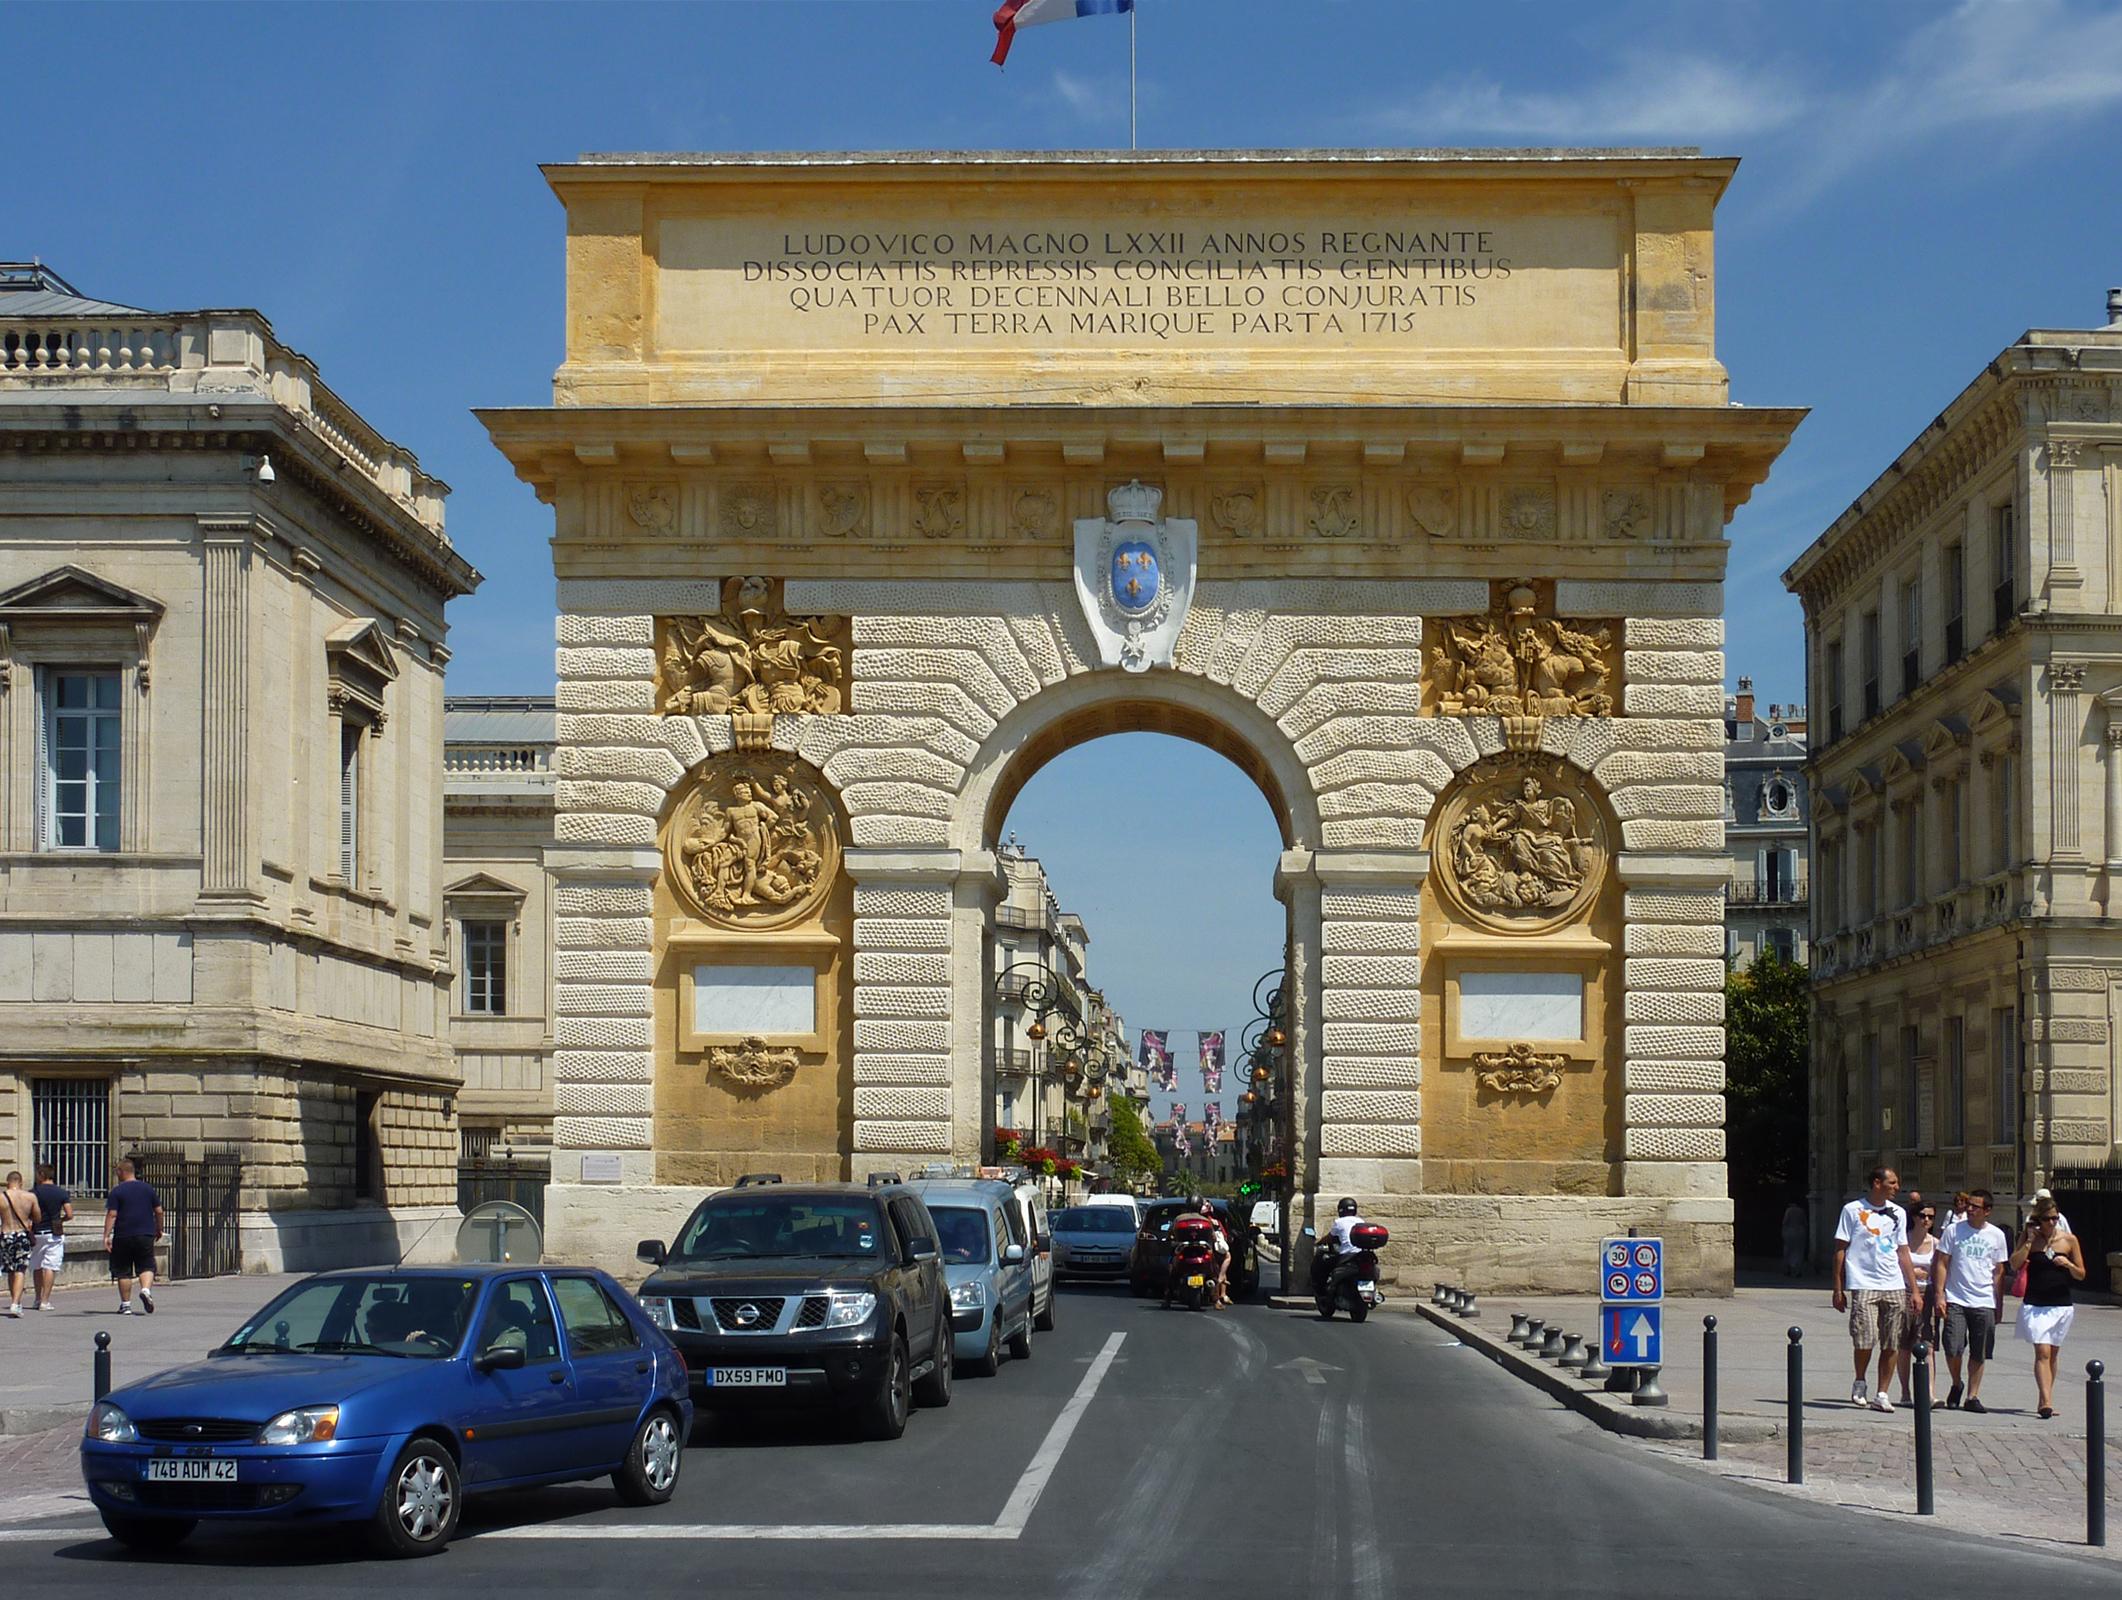 File 232 montpellier l 39 arc de triomphe la fa ade ouest jpg wikimedia commons - Arc de triomphe montpellier ...